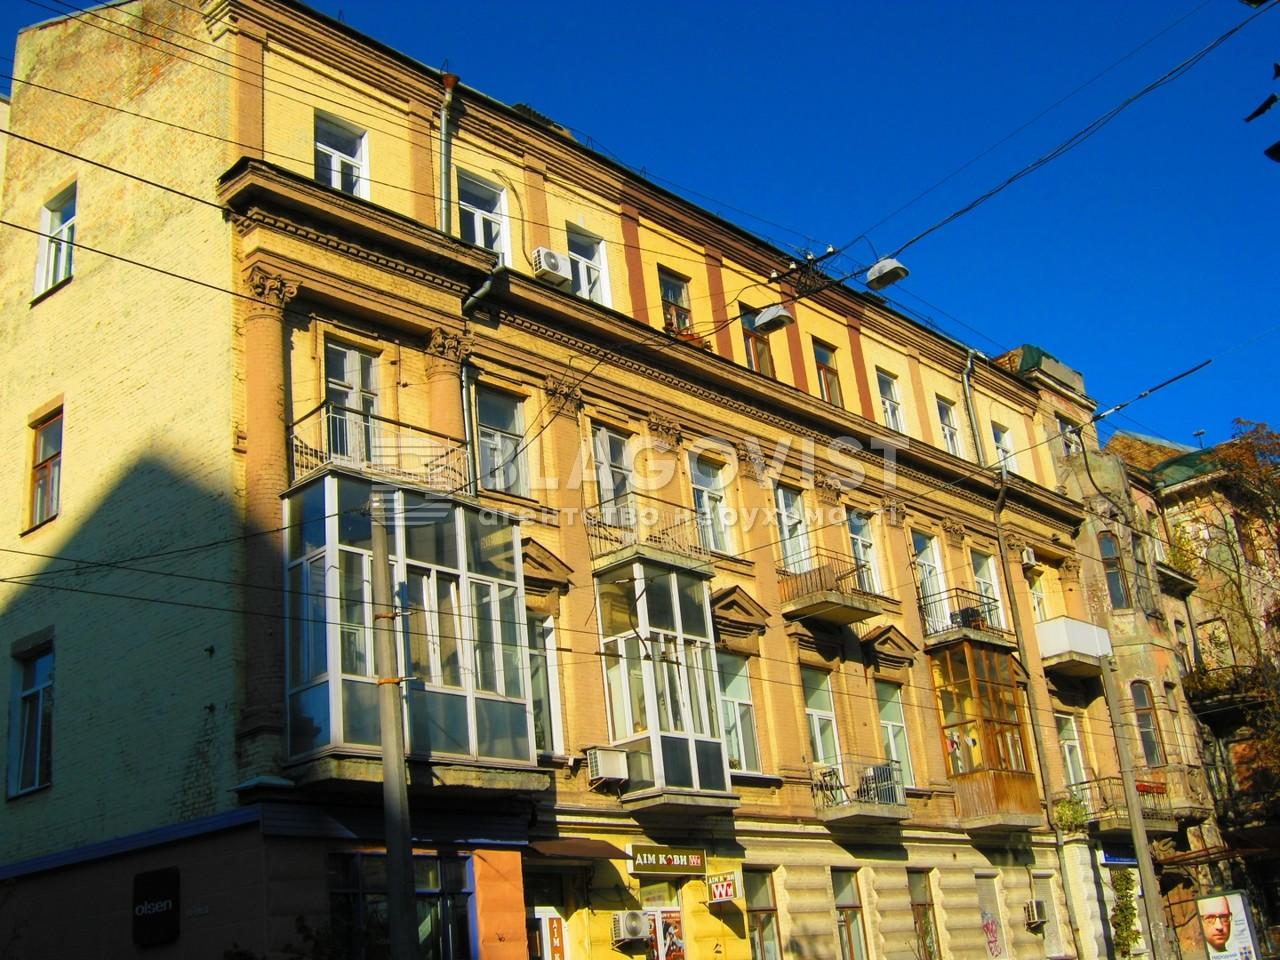 Нежитлове приміщення, D-34943, В.Житомирська, Київ - Фото 1